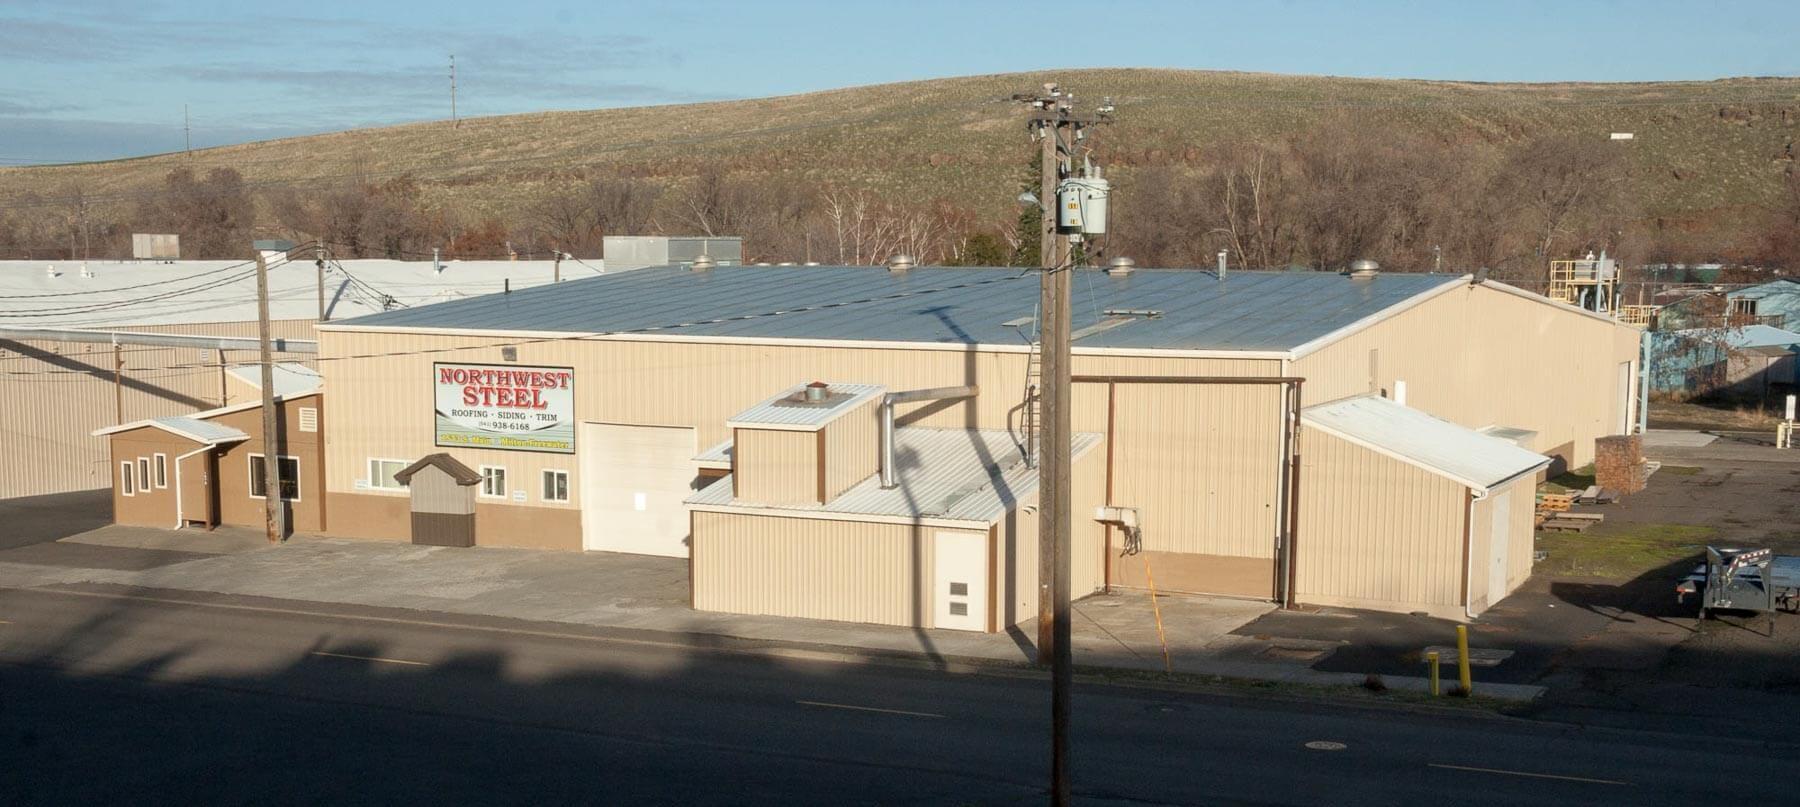 Northwest Steel Milton Freewater, OR location